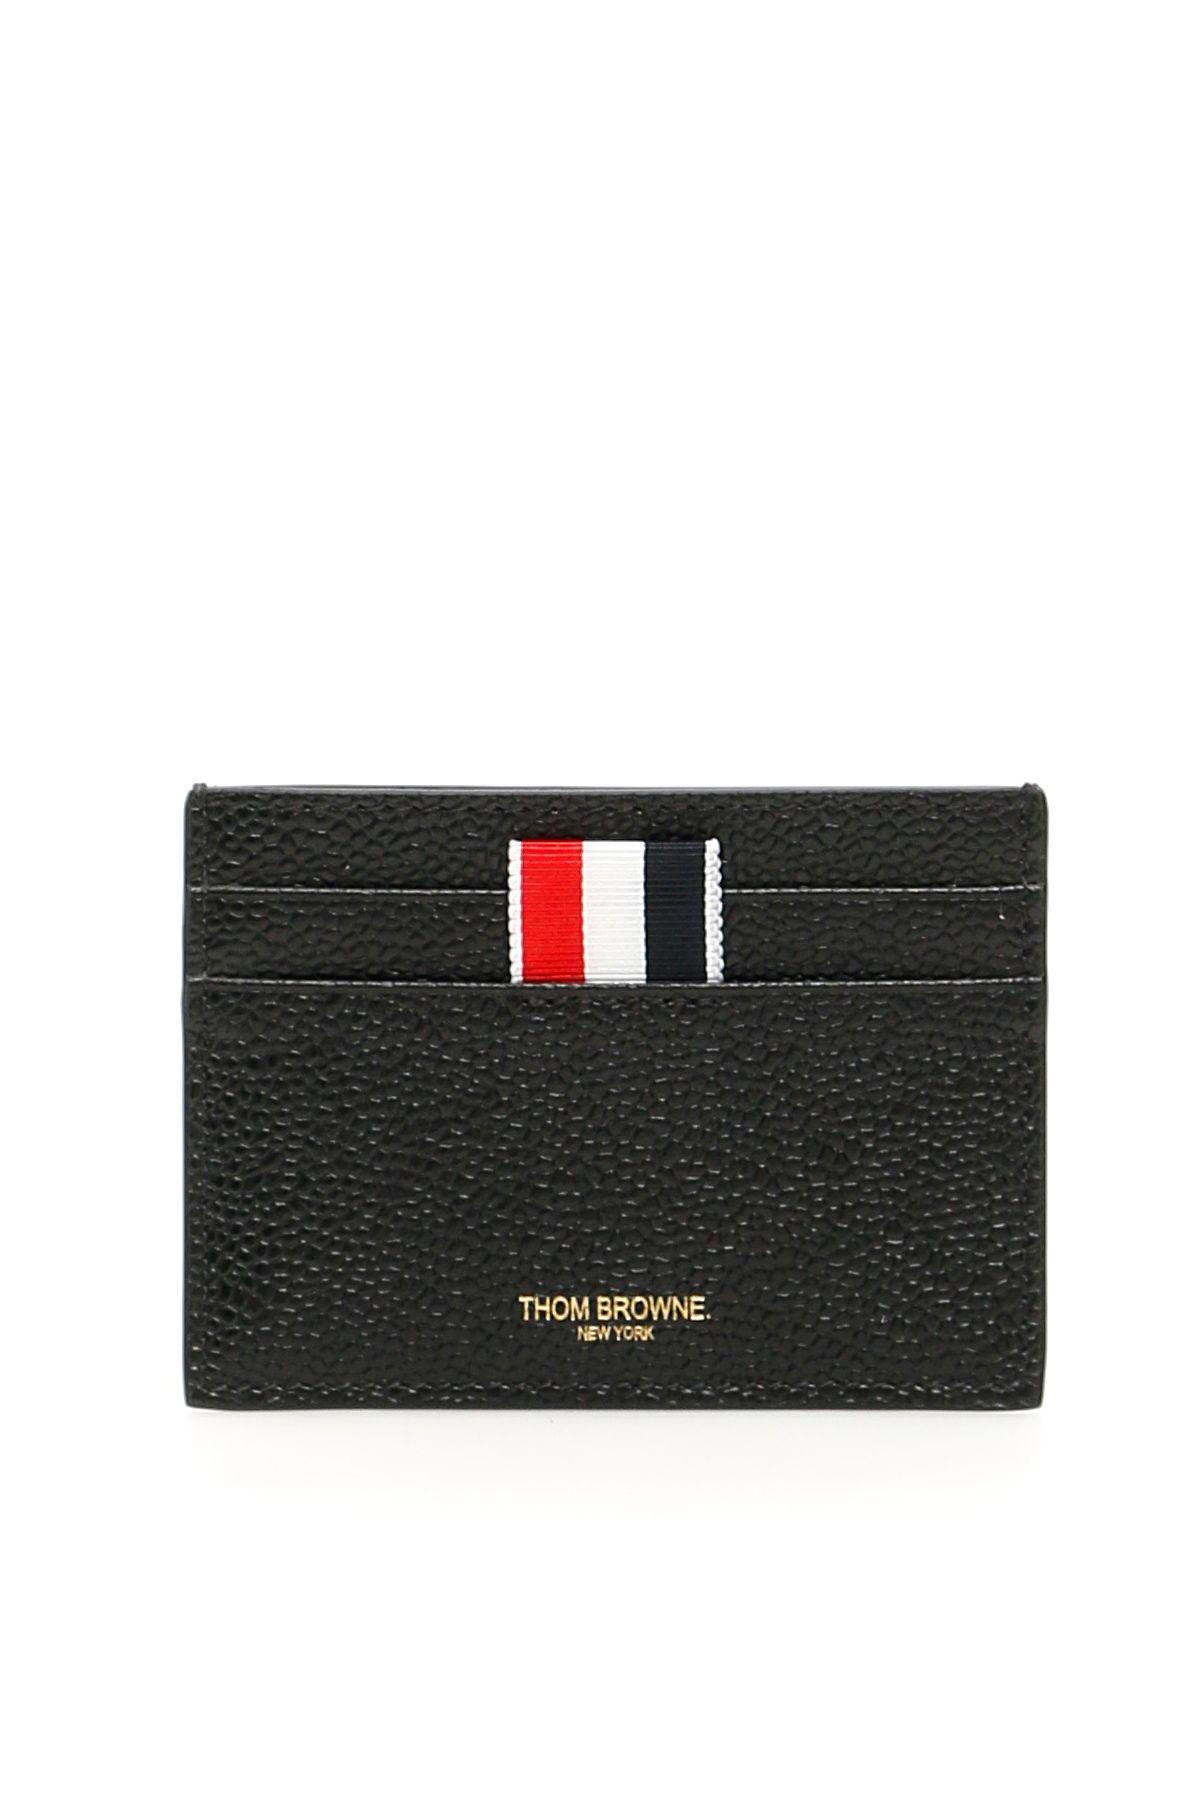 32583a5d4d Thom Browne Thom Browne Grain Leather Cardholder - BLACK (Black ...